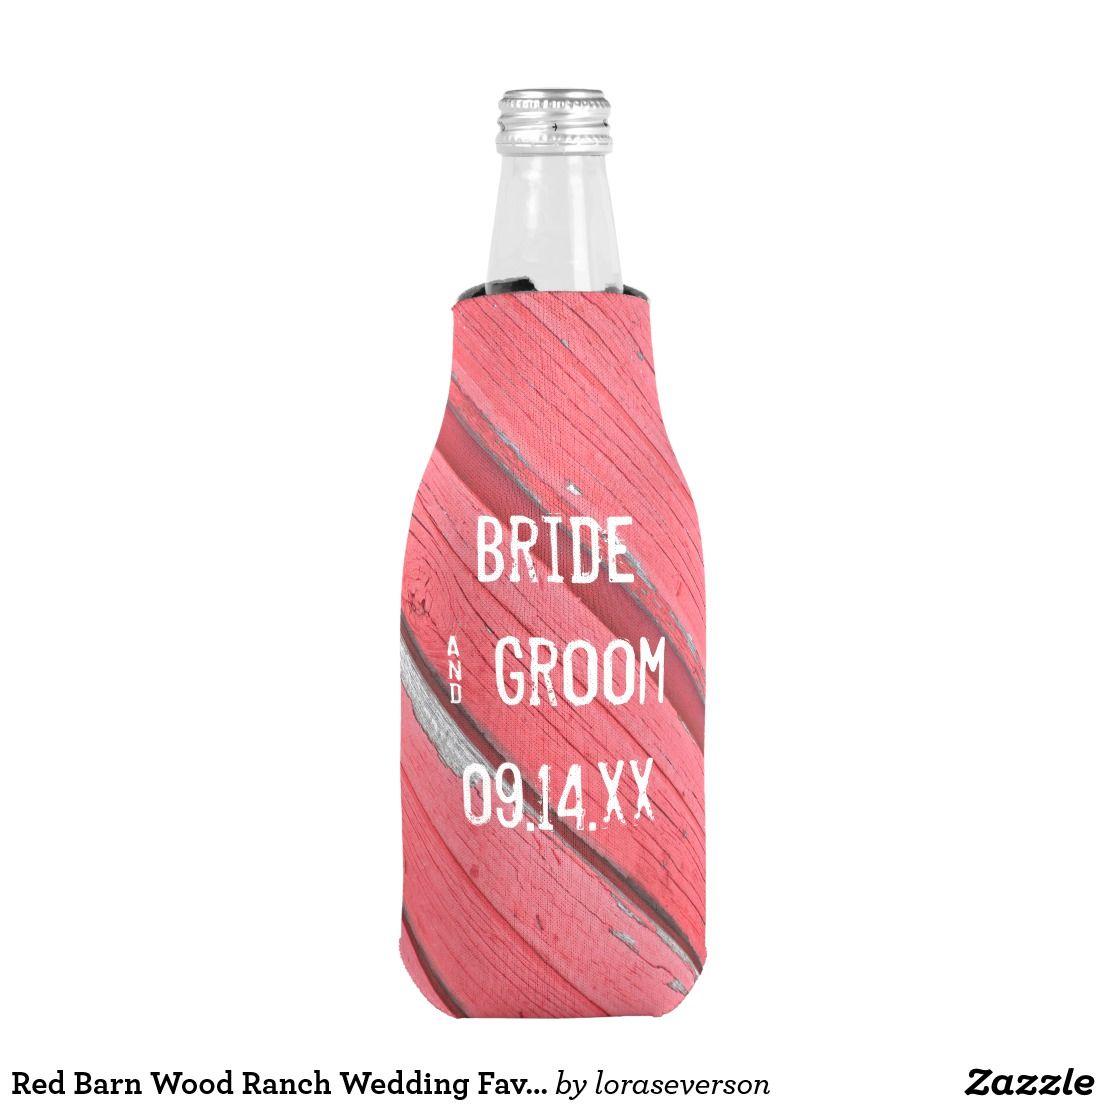 Red Barn Wood Ranch Wedding Favor Bottle Cooler   Wedding Koozies ...